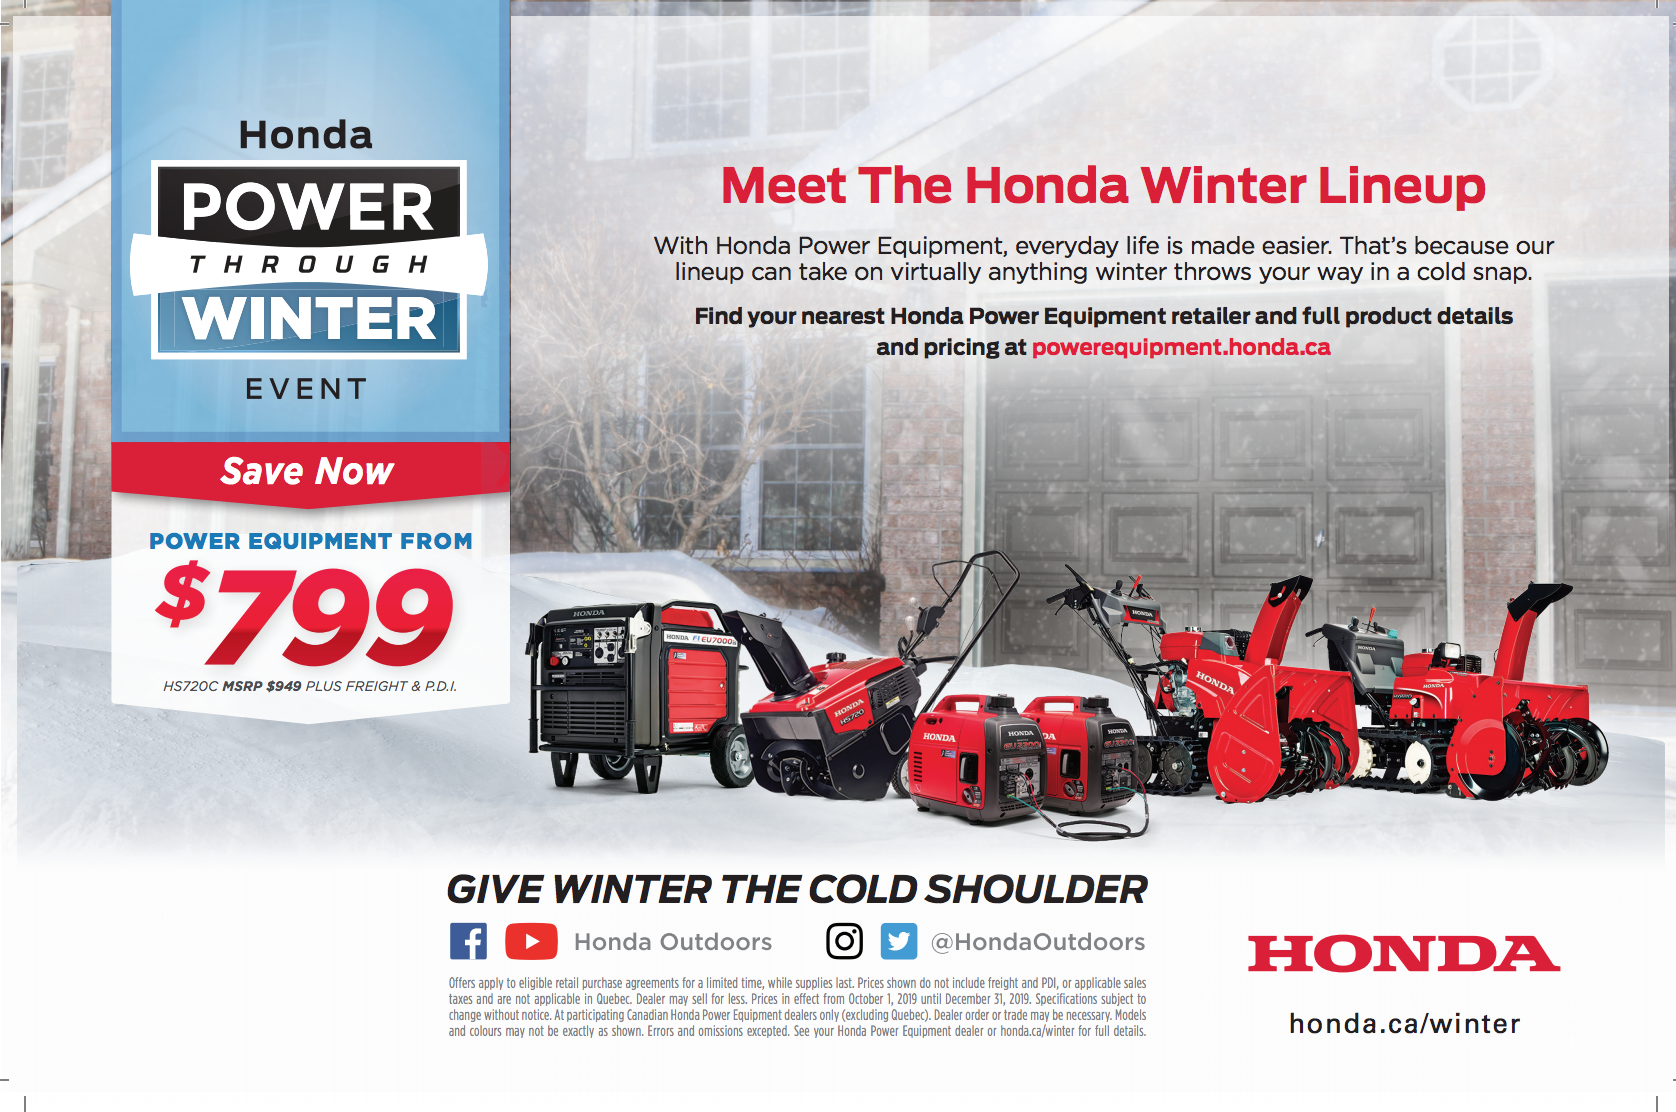 Power Through Winter